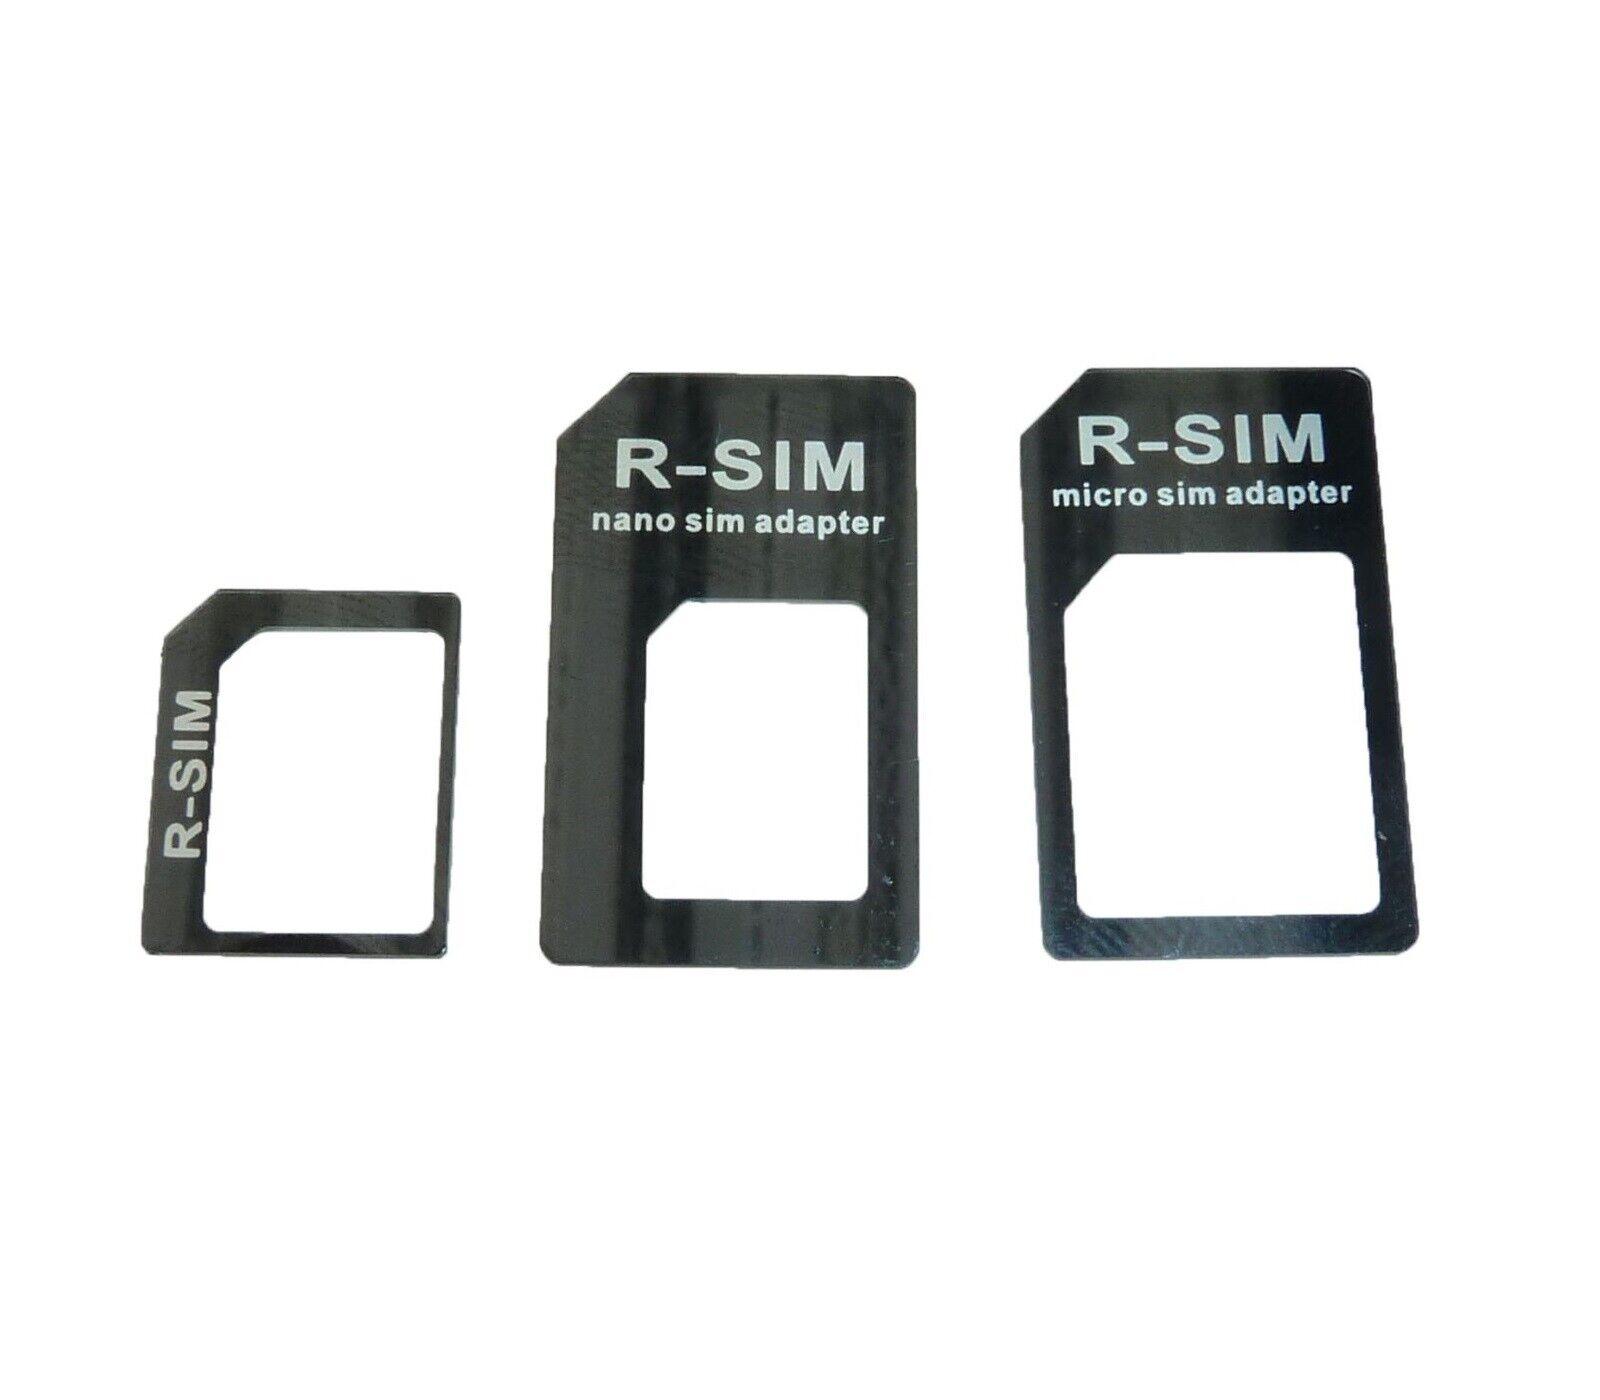 Nano Sim Karte Bilder.Nano Sim Karten Adapter 3 In 1 Und Micro Sim Adapter Iphone 4 4s